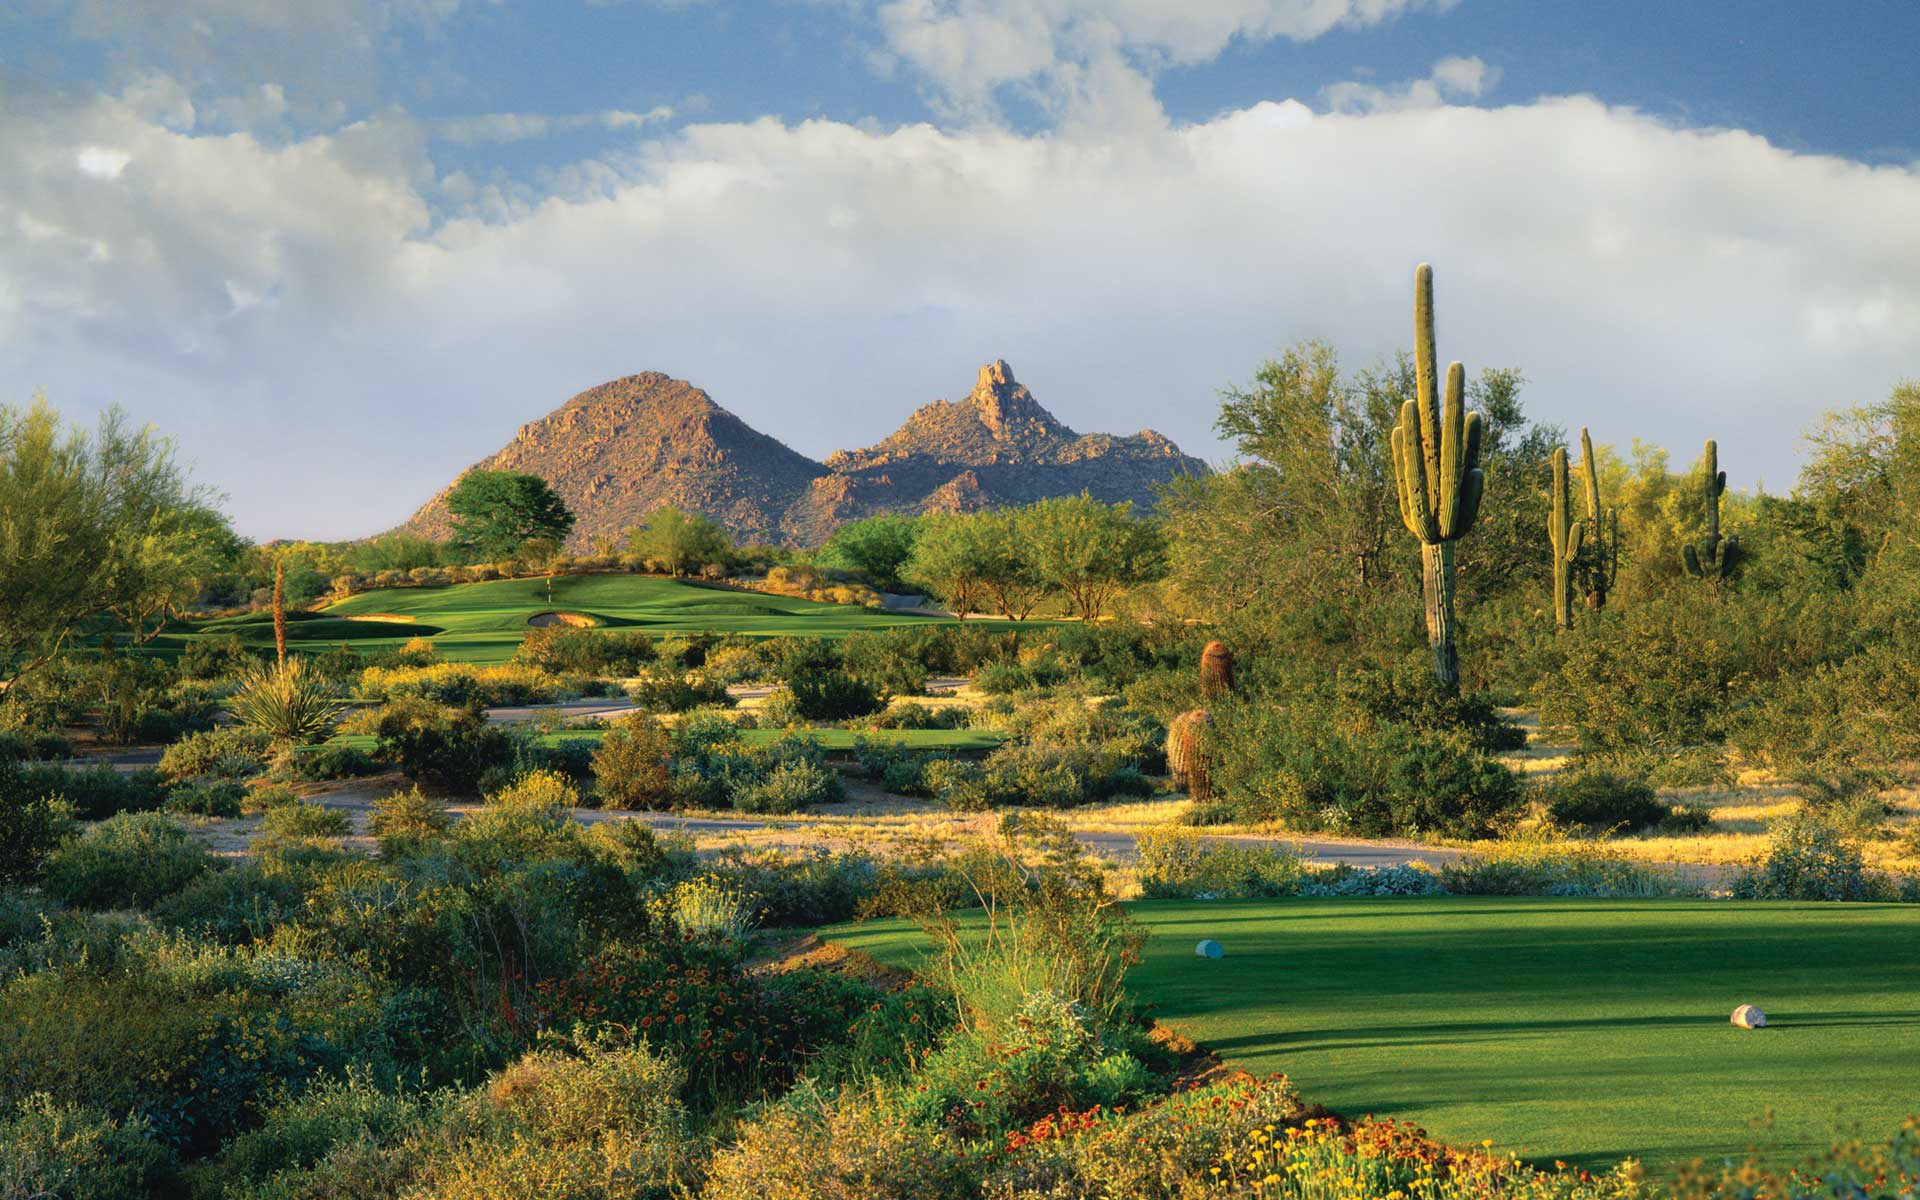 phoenix arizona golf course wallpaper 68308